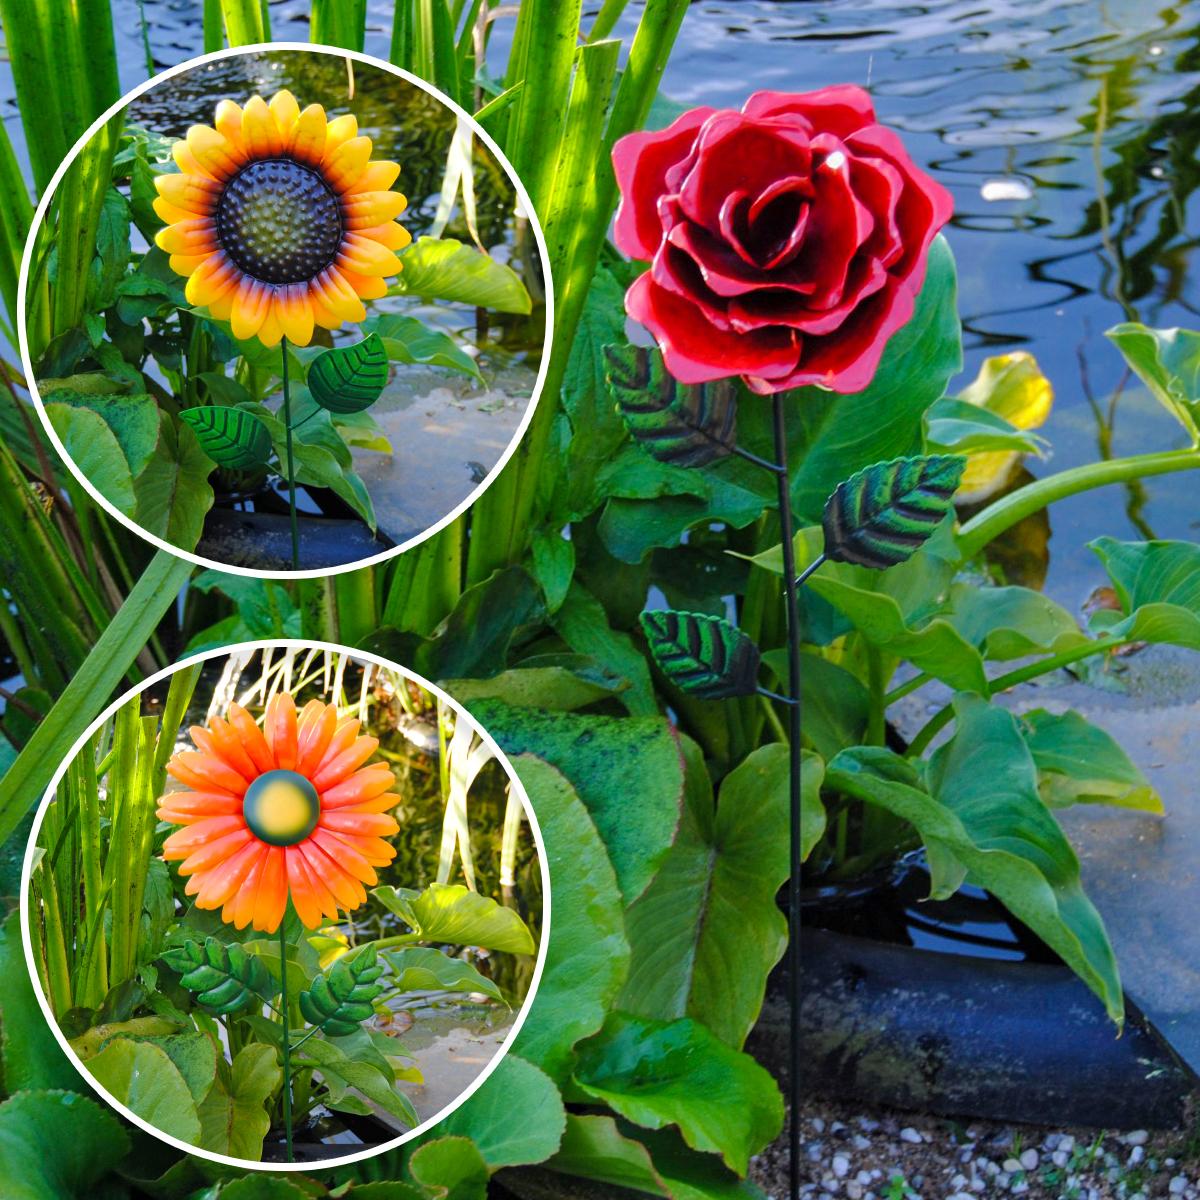 Frühlings-/Sommerblumen aus Metall Image